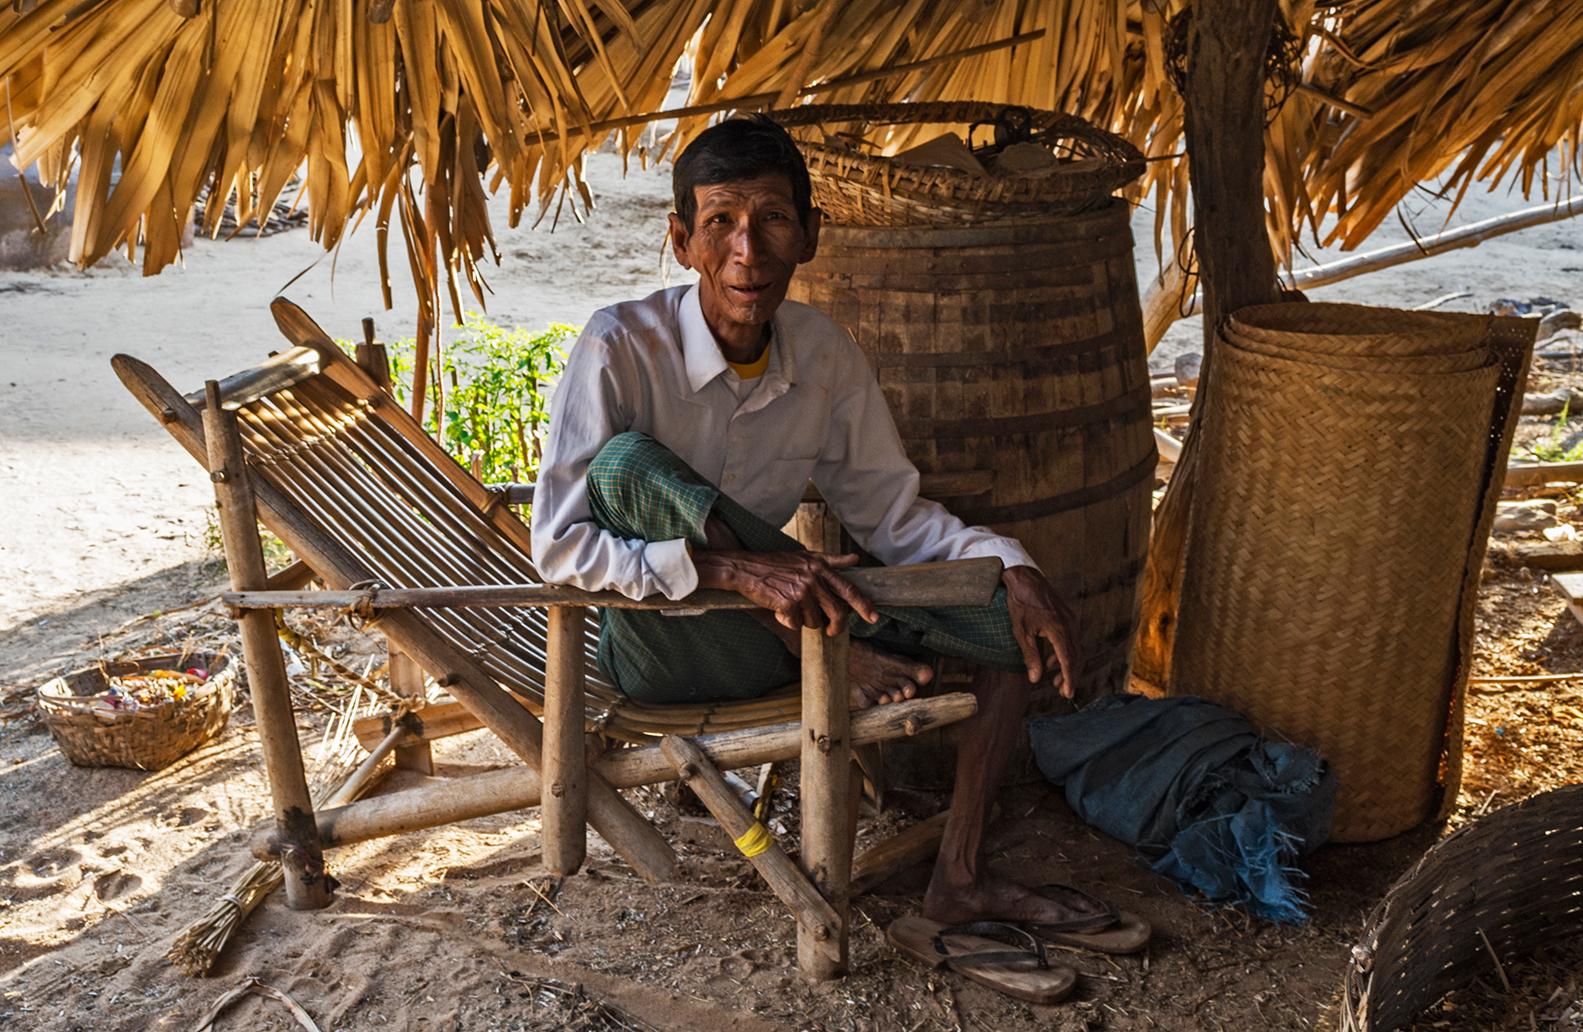 Mandalay-village-life-06_s.jpg